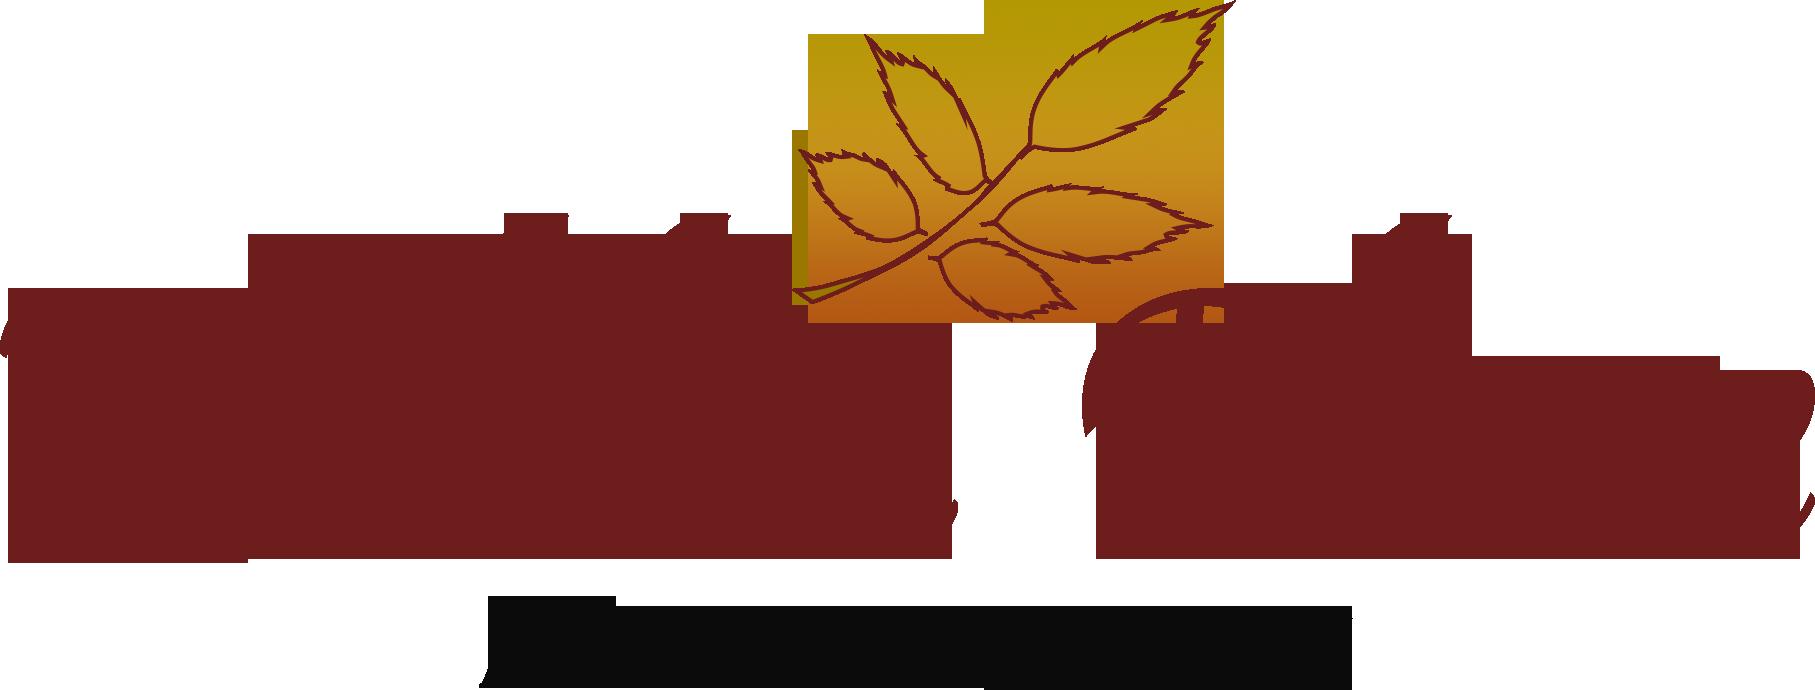 Weblin Place Apartments